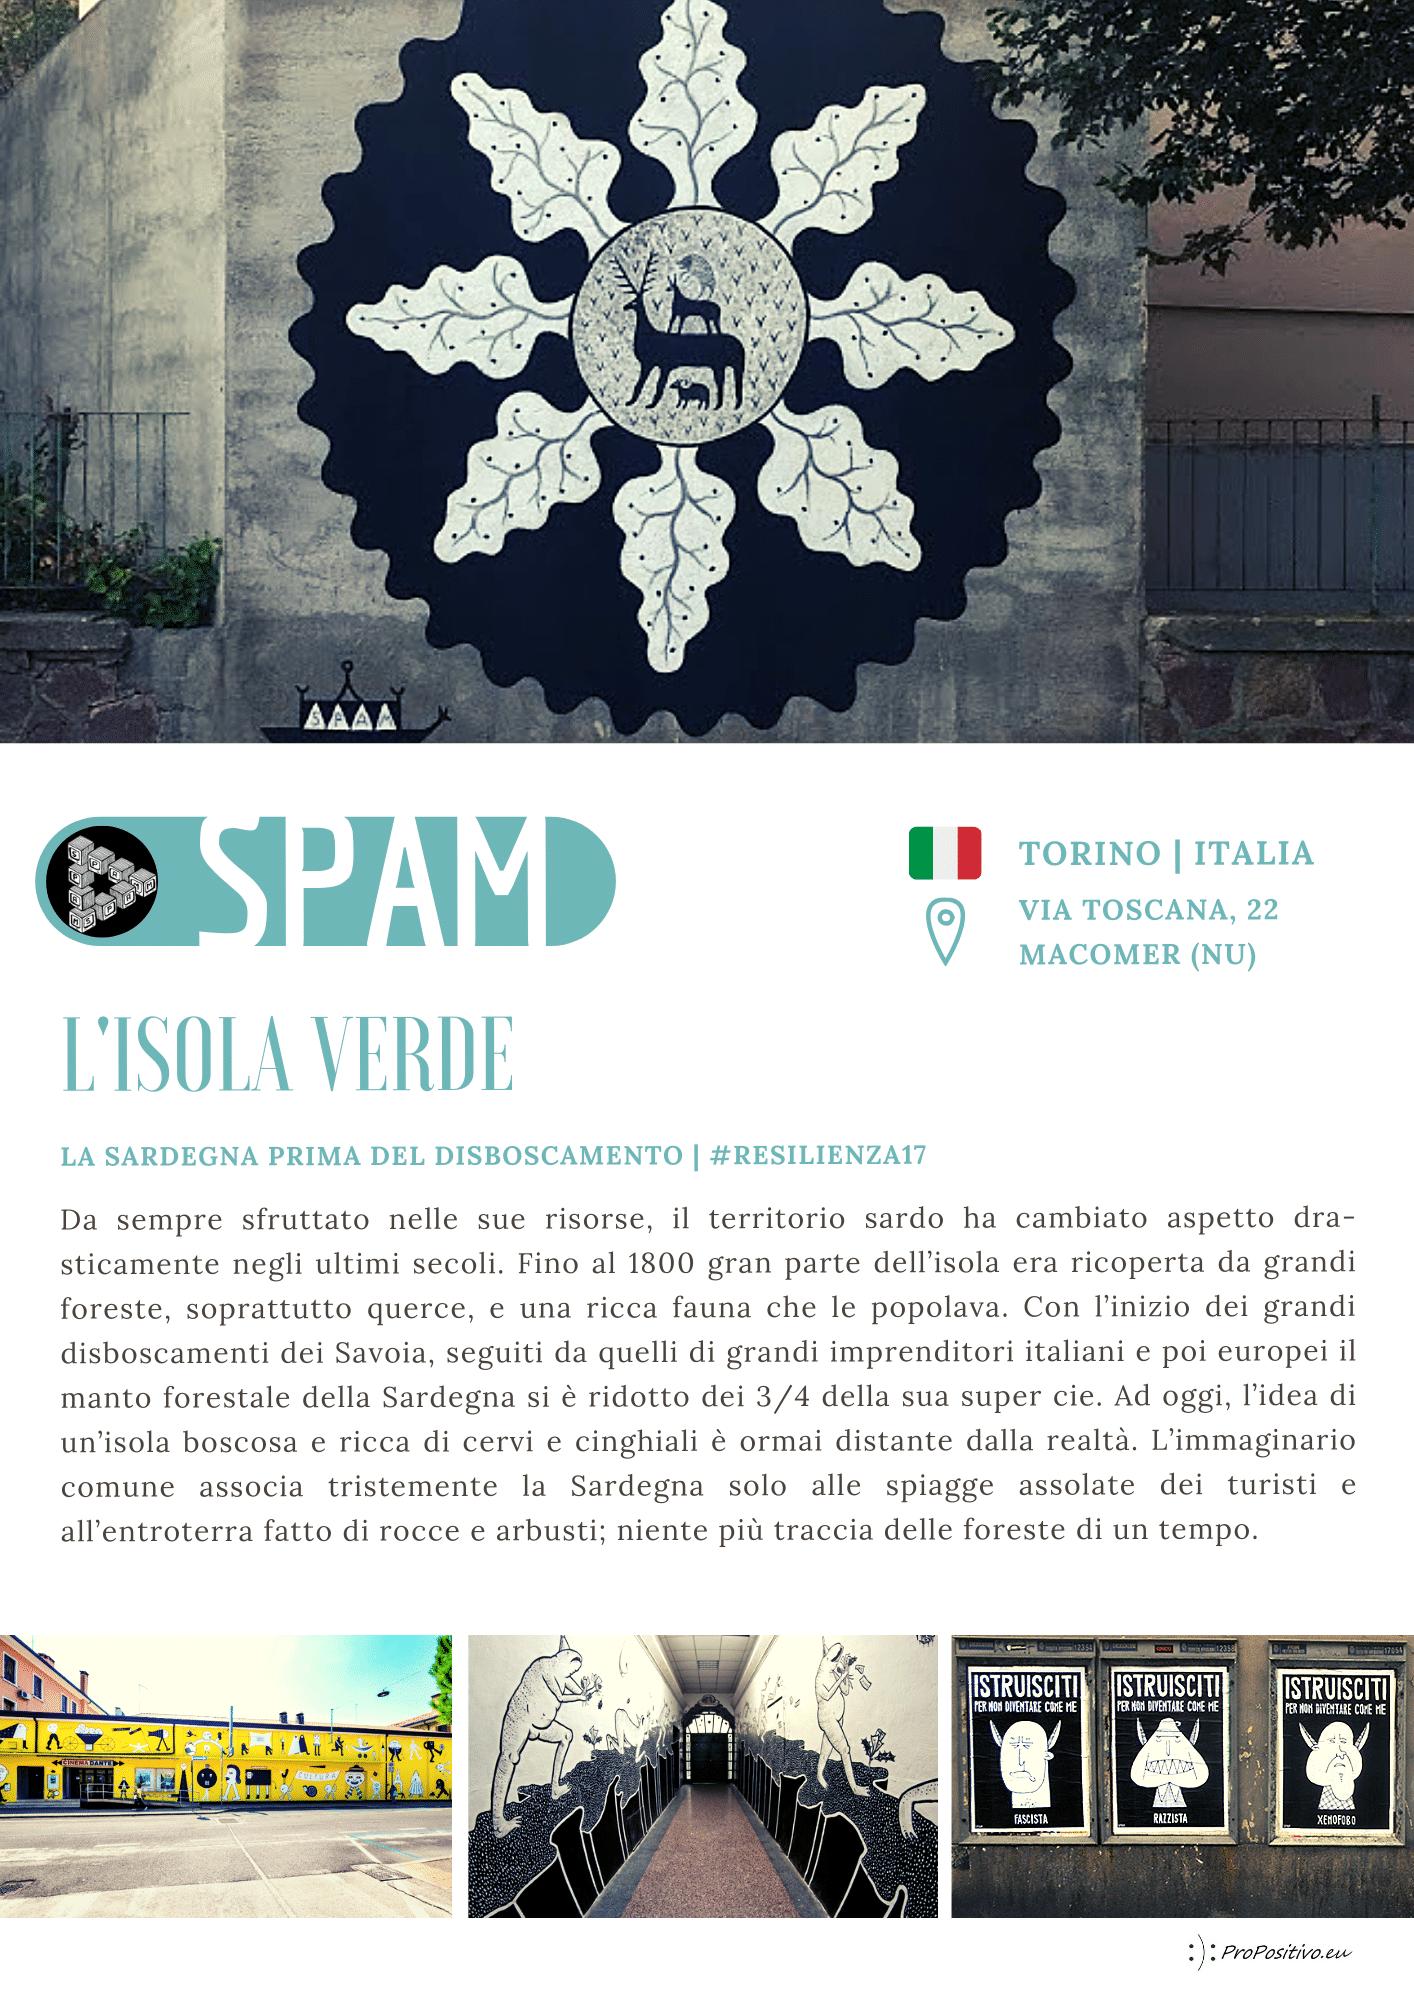 30 spam catalogo murales street art macomer sardegna festival resilienza propositivo